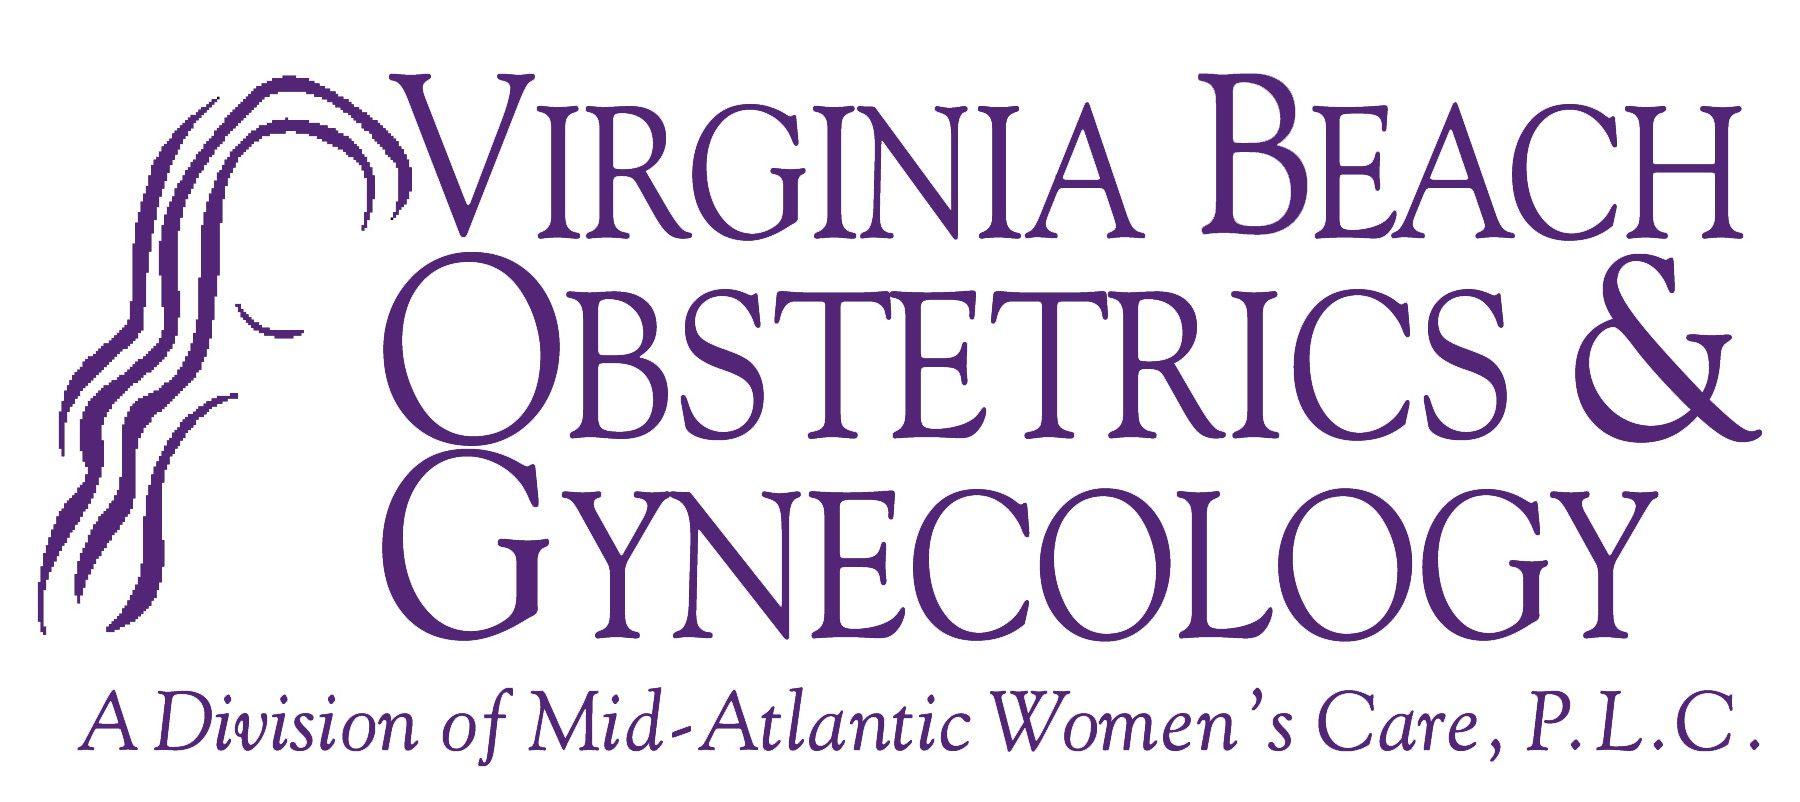 Virginia Beach Va In Virginia Virginia Beach Obstetrics